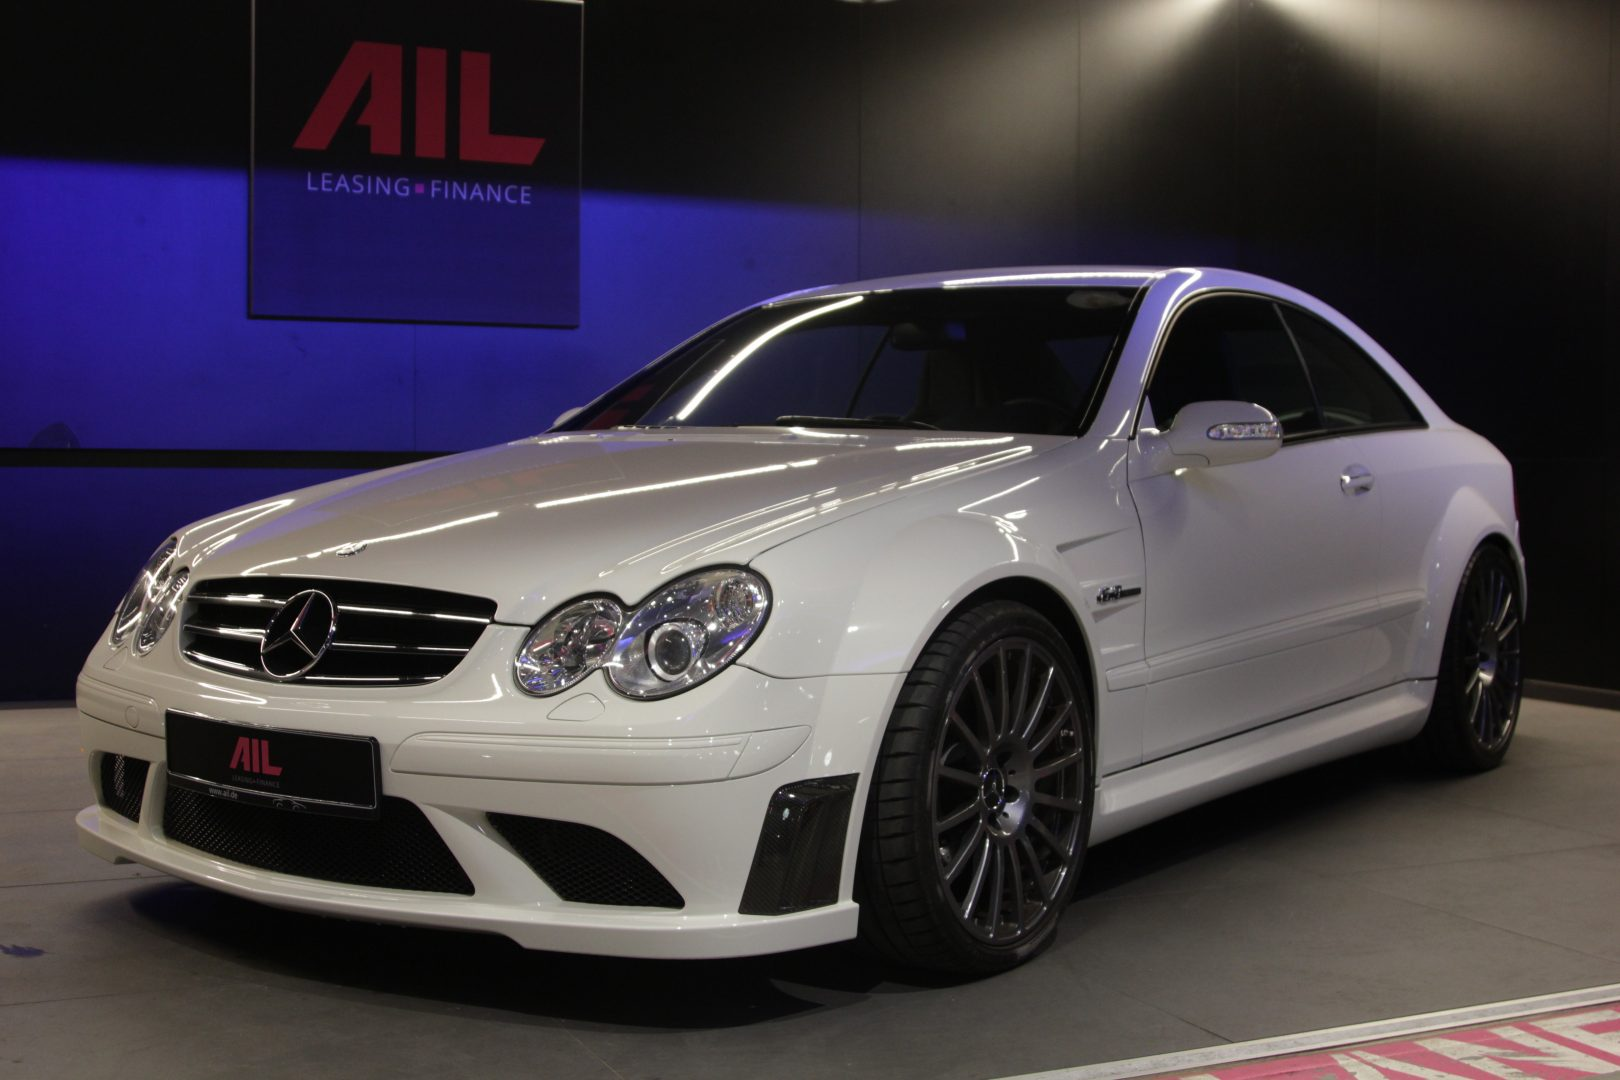 AIL Mercedes-Benz CLK 63 AMG Black Series 3